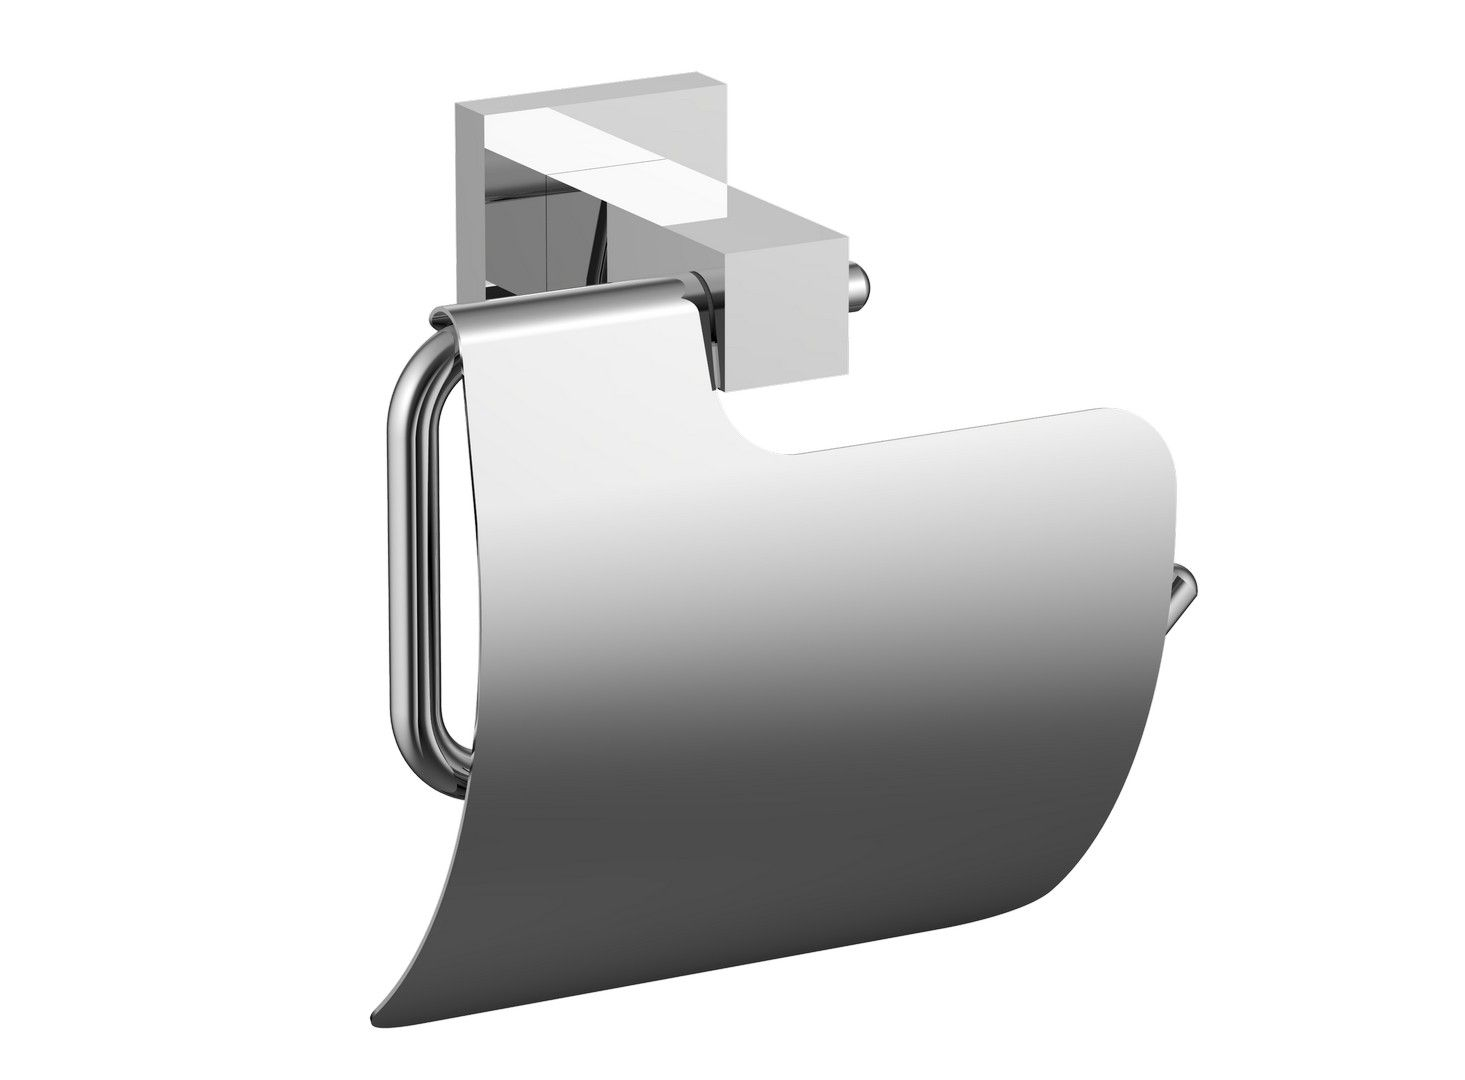 Eviva Toilet Paper Holdy Toilet Paper Holder Brushed Nickel